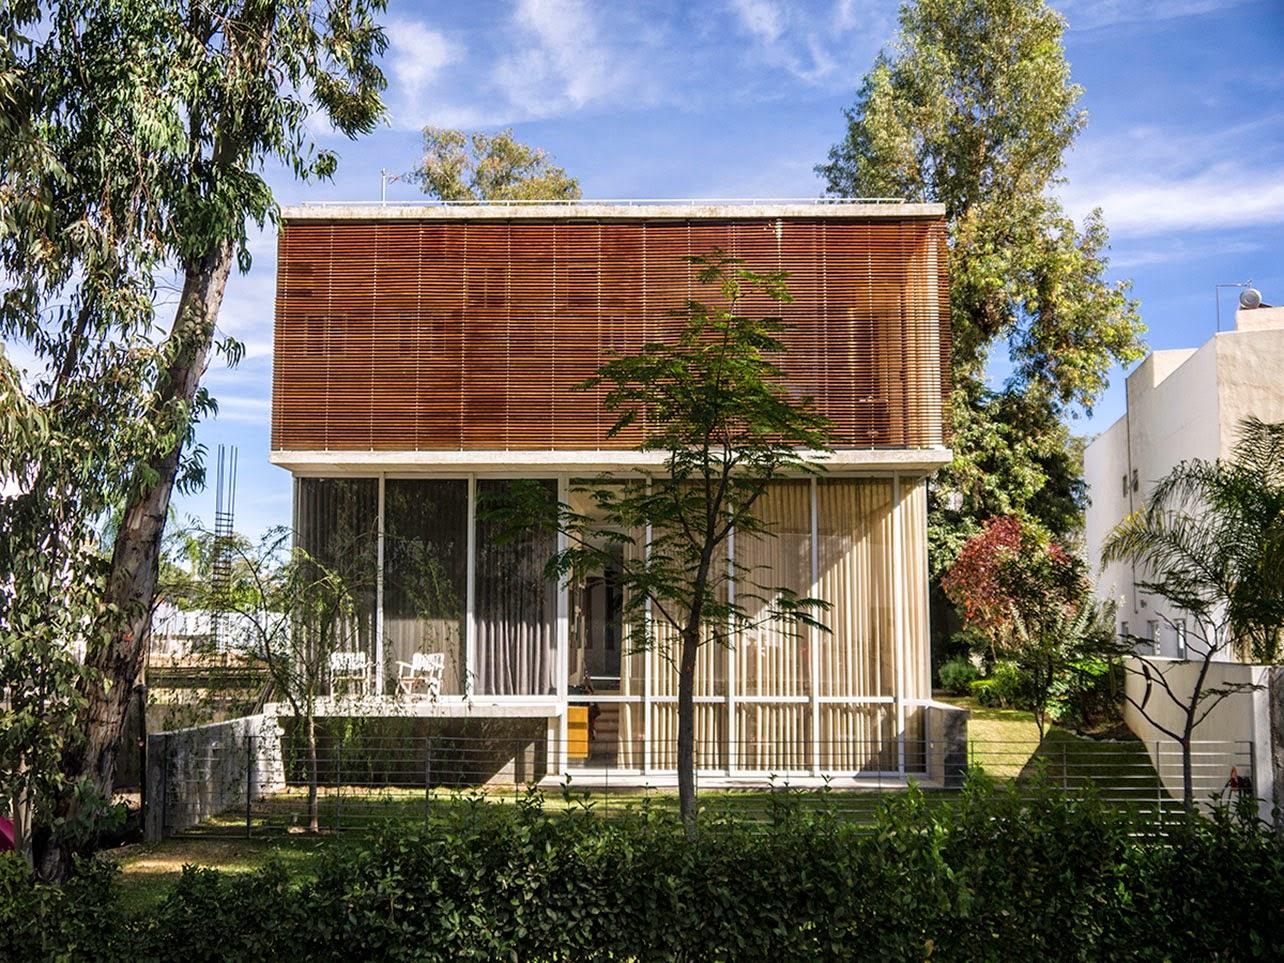 10 desain denah rumah minimalis modern 2 lantai type 45 - Desain Rumah Minimalis 2 Lantai Type 45